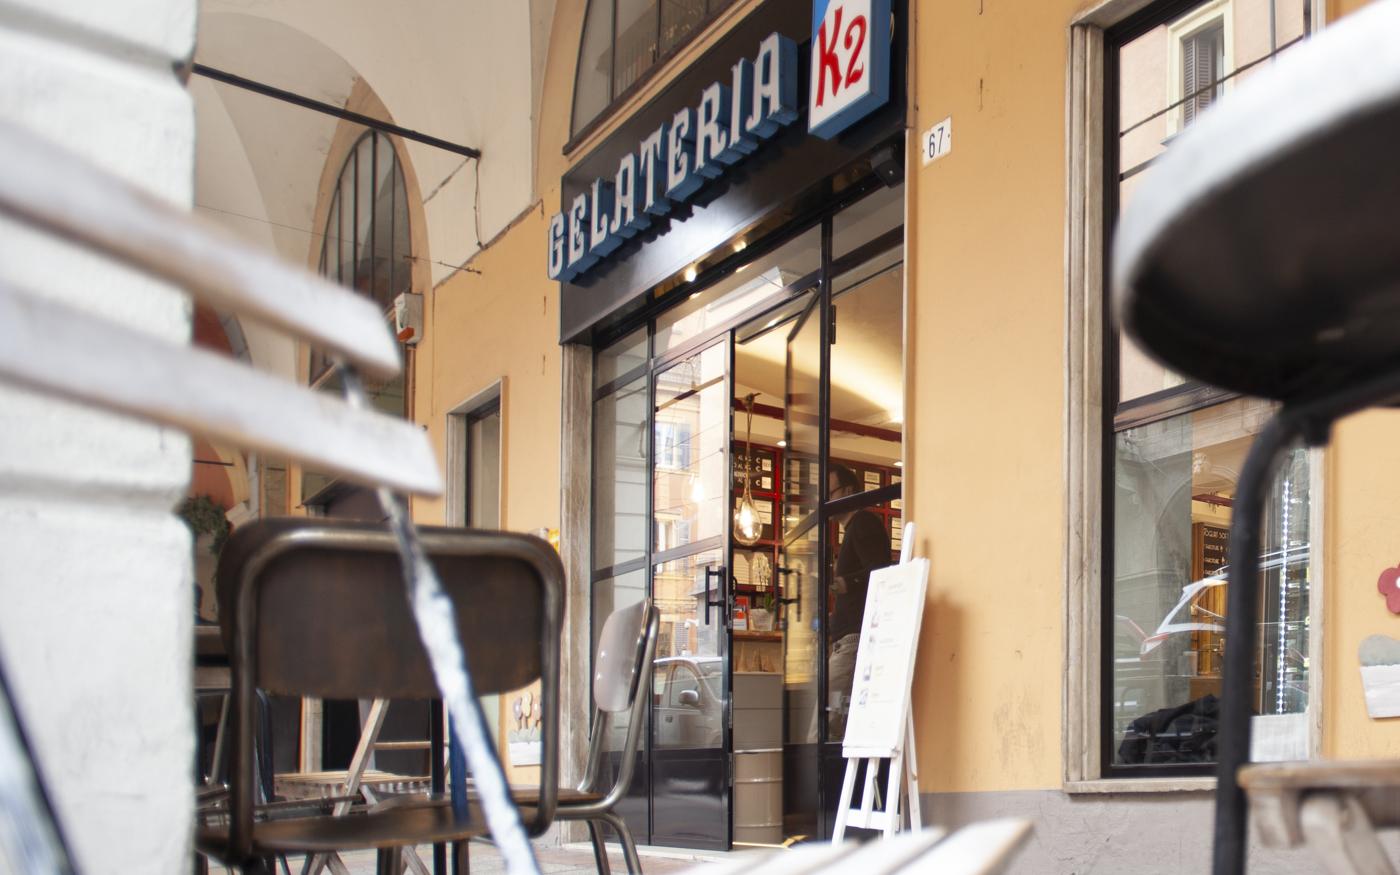 Gelaterie: arredamento gelateria K2 – Modena